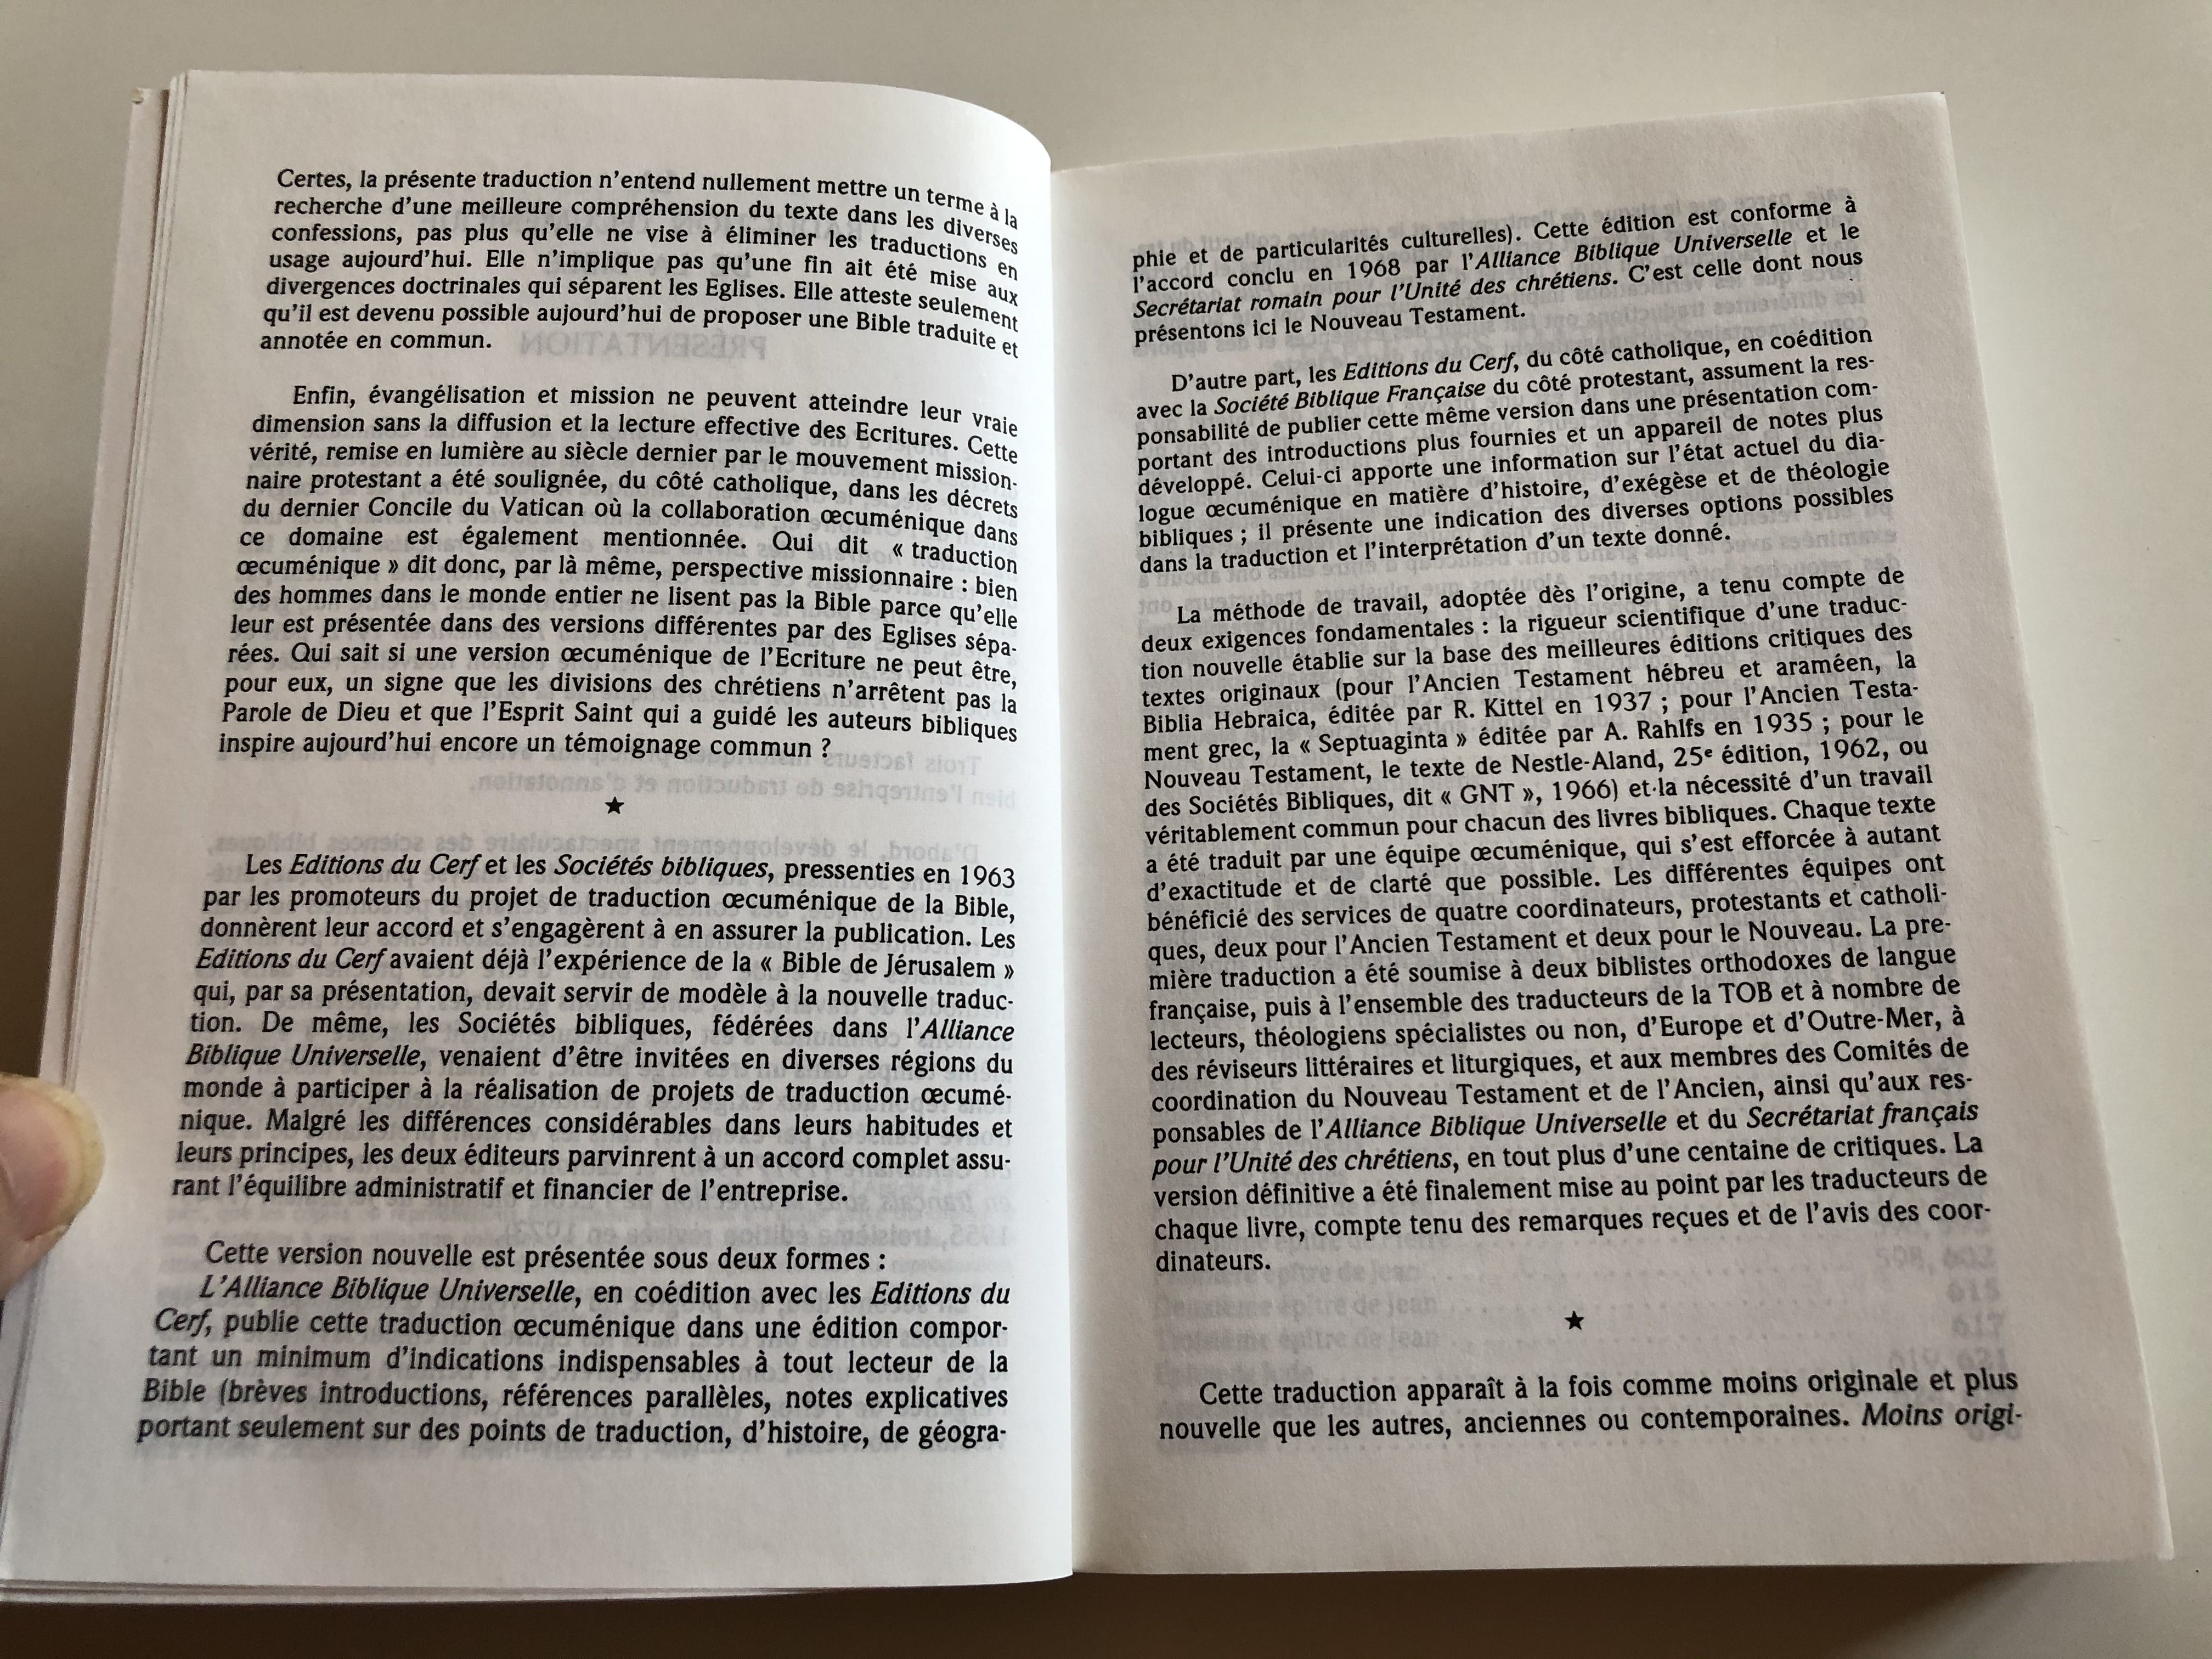 -nouveau-testament-french-language-tob-new-testament-paperback-5.jpg